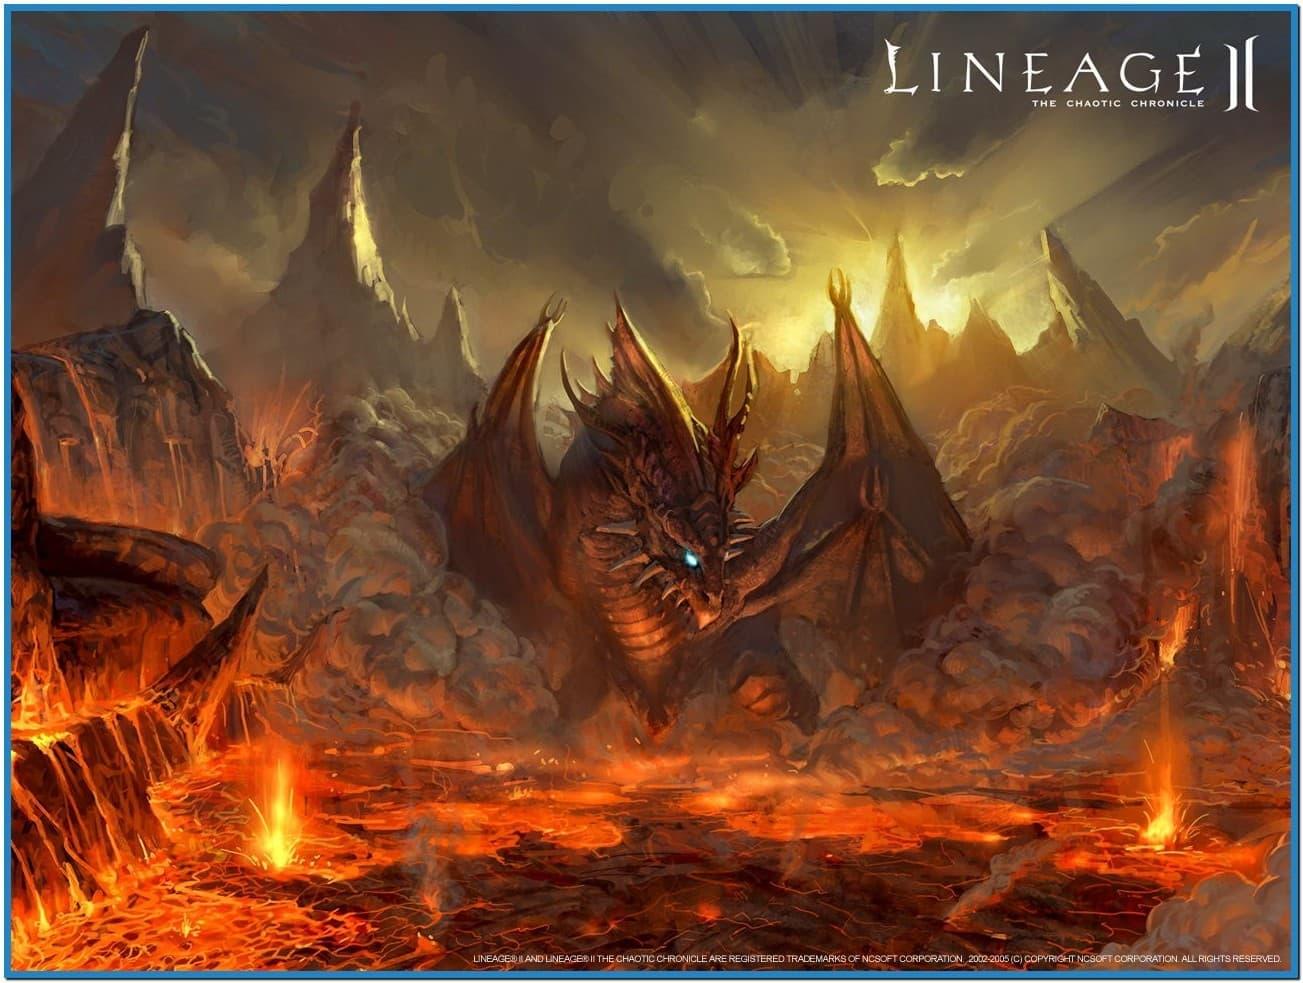 Screensavers wallpaper of dragons   Download 1303x983